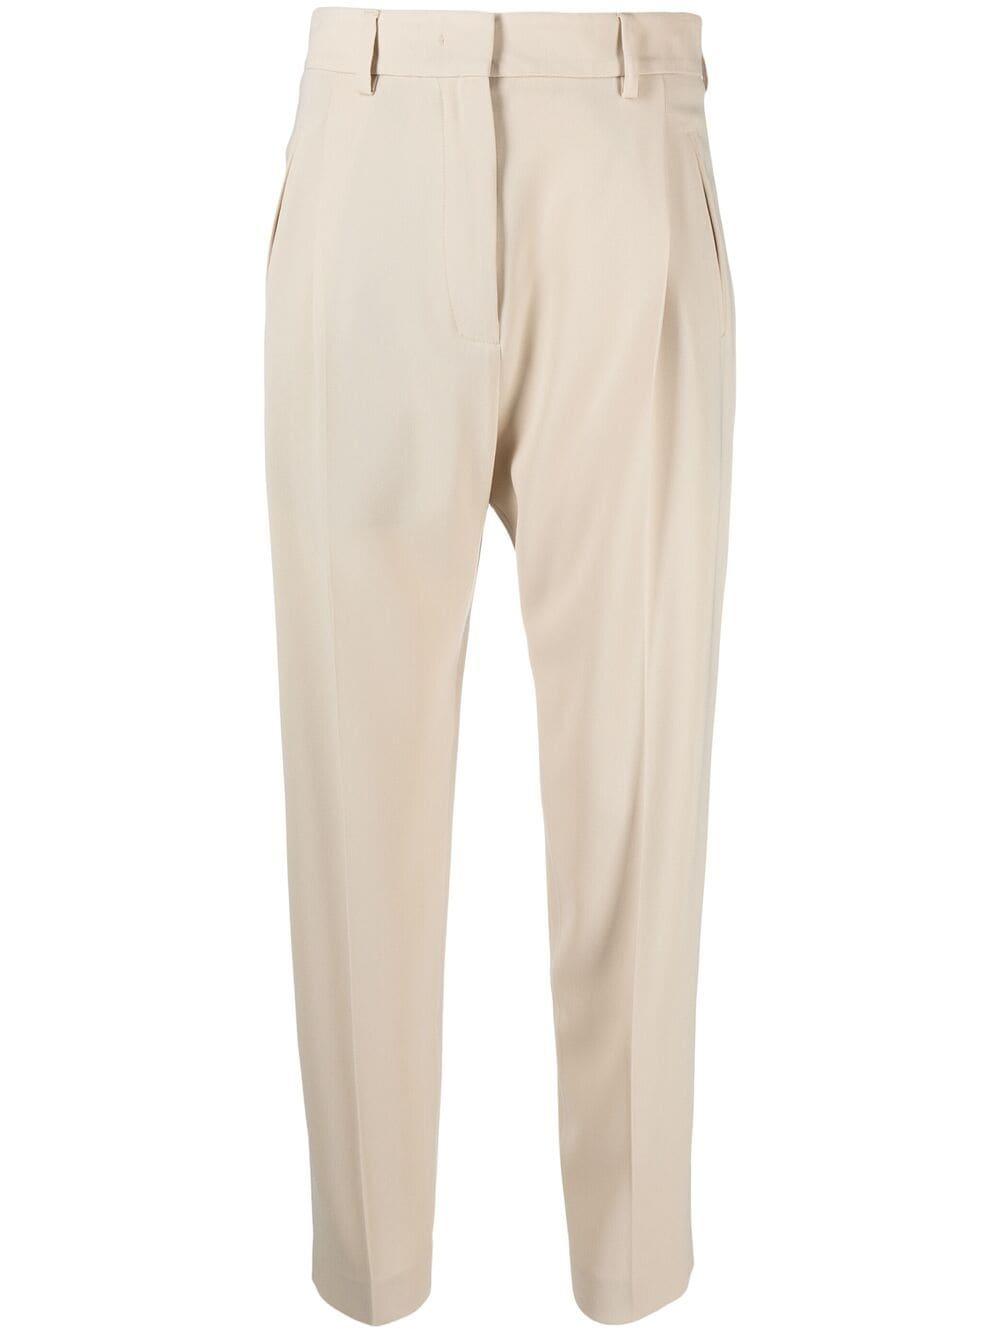 Pantaloni sartoriali bianco avorio a vita alta con piega stirata ALBERTO BIANI | Pantaloni | CC859-AC0028110